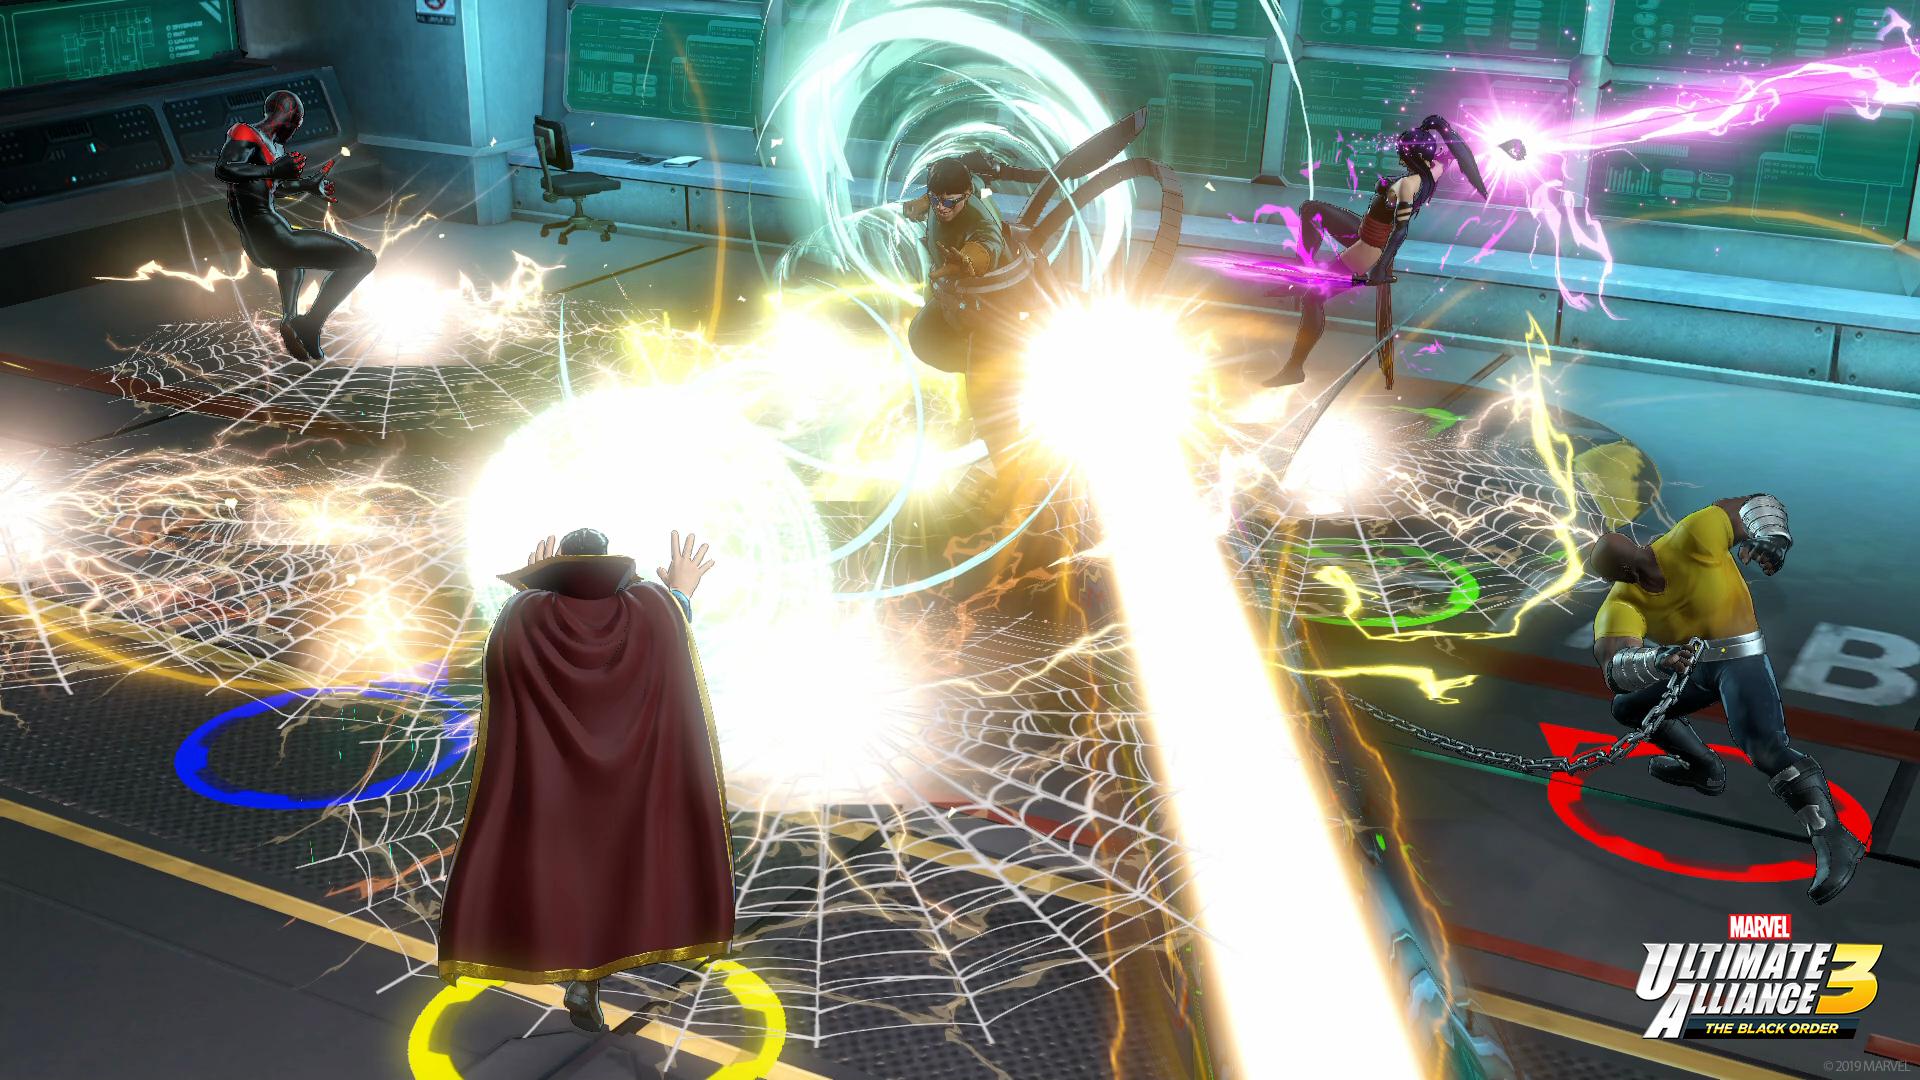 Marvel Ultimate Alliance 3 powers